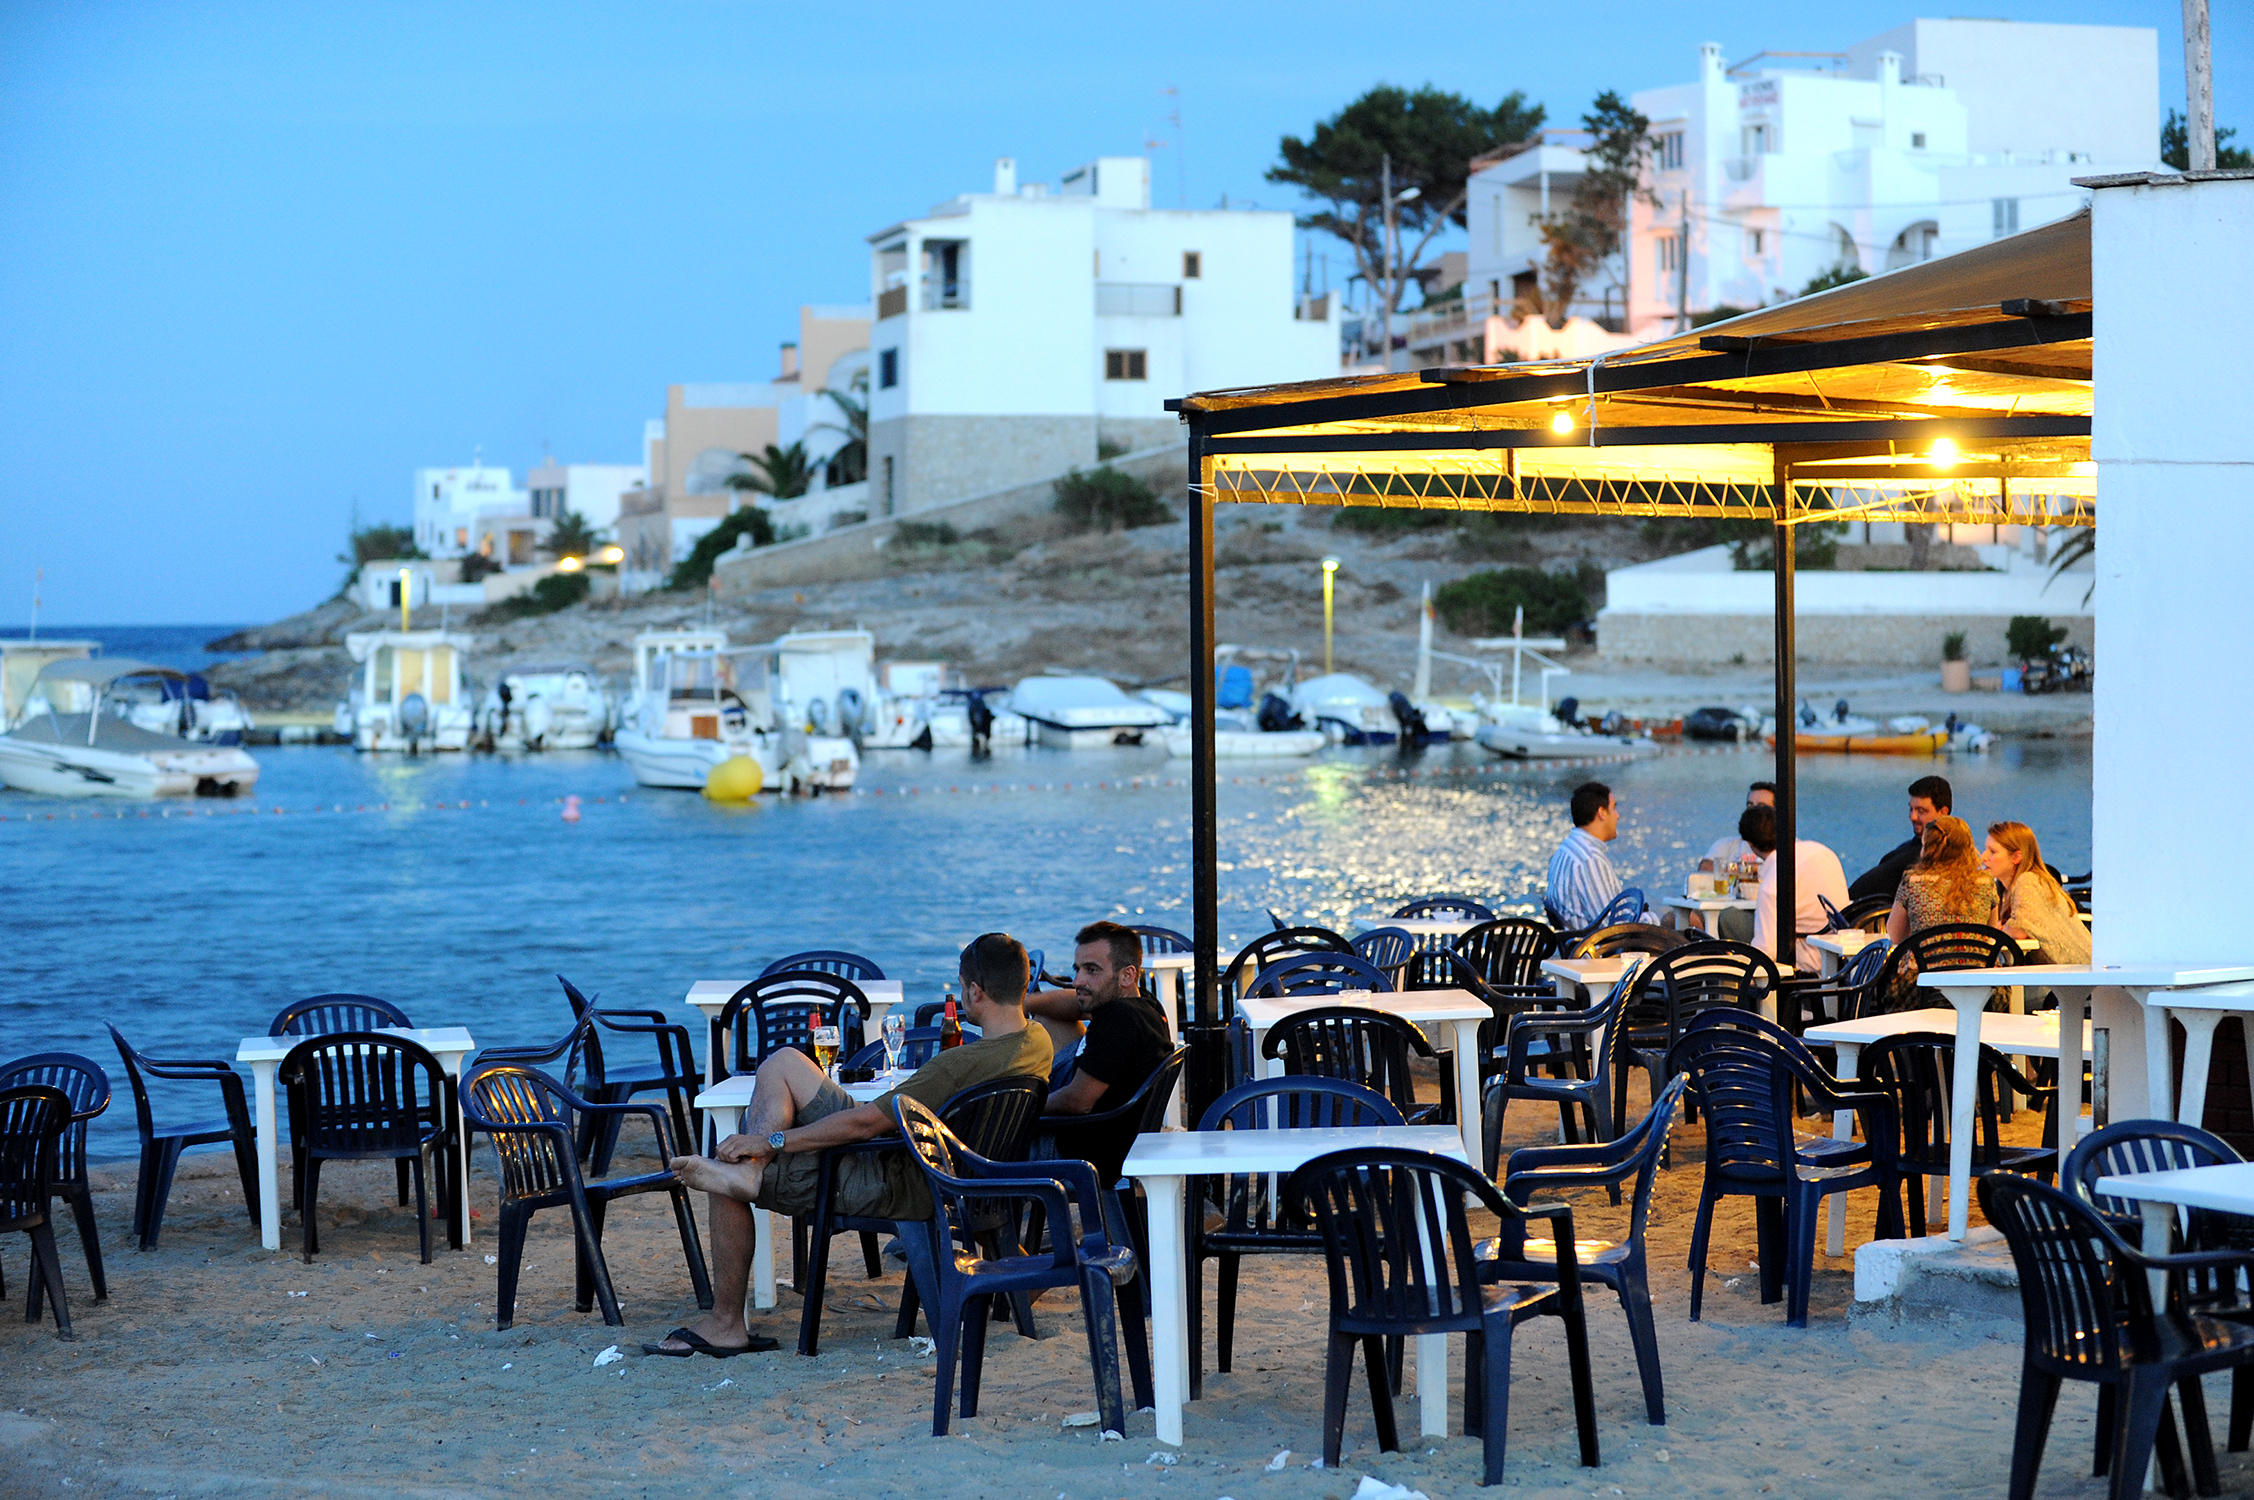 rantakahvila, Ibiza, Baleaarit, Espanja, matkablogi, blogi